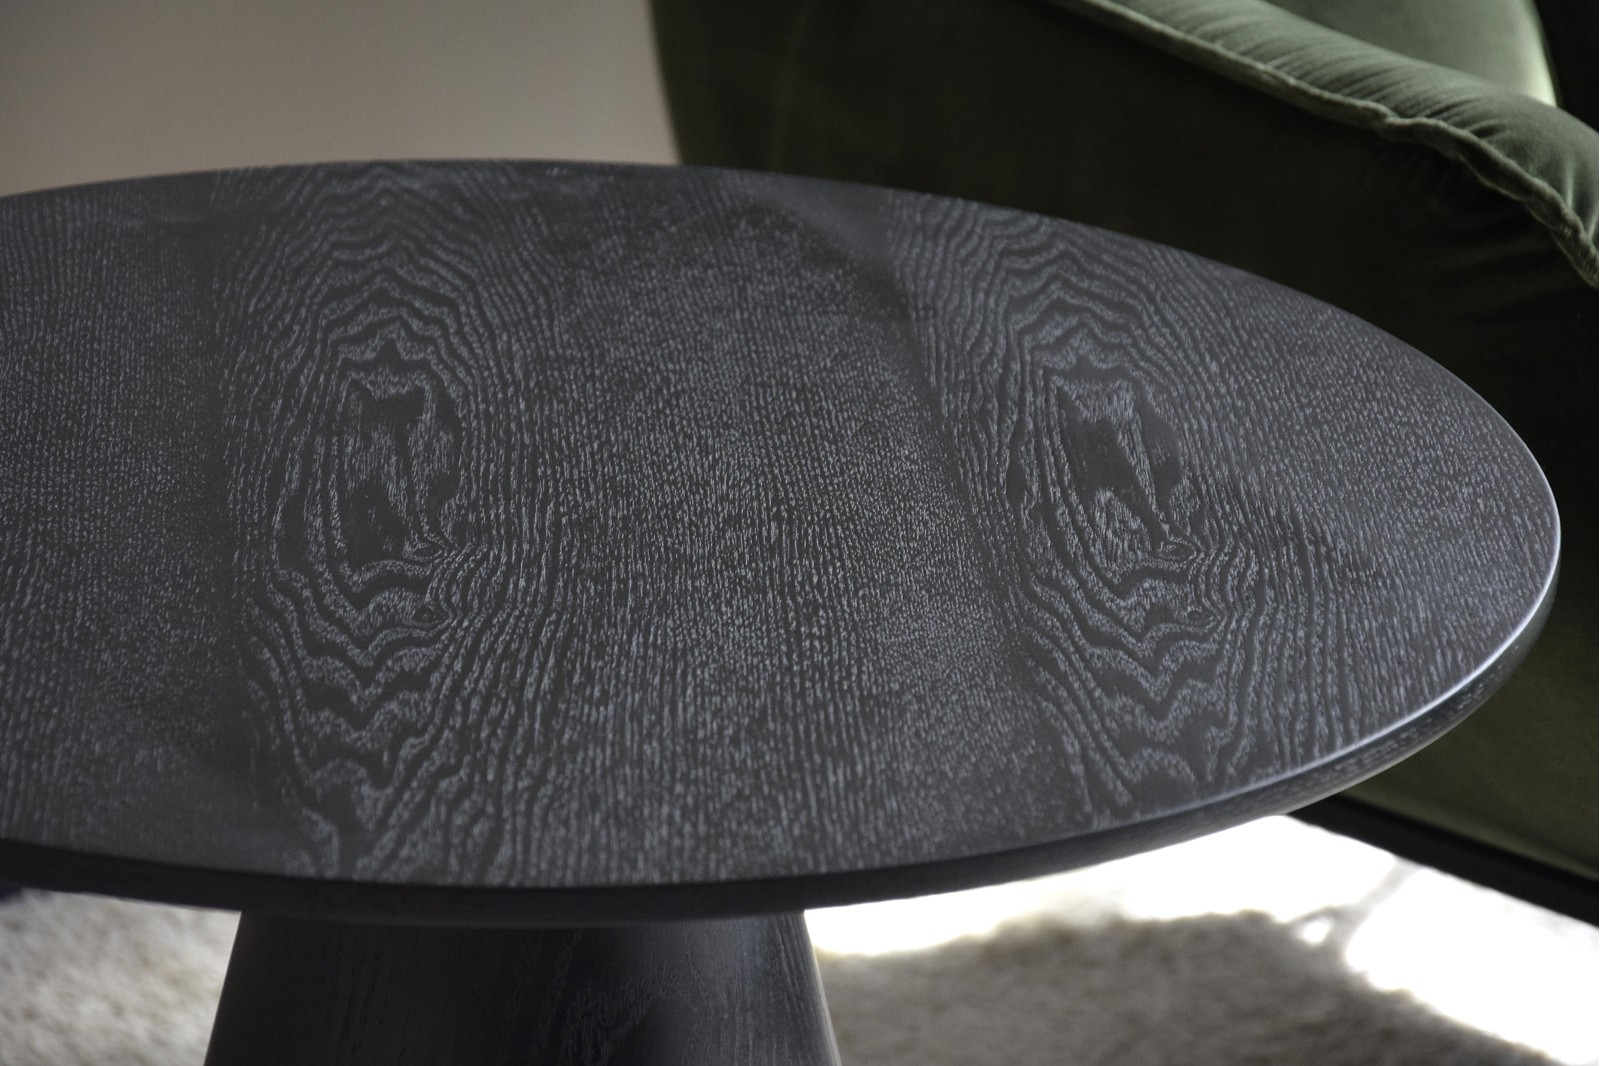 ROUND SIDE TABLE. MATT BLACK ASH VENEER